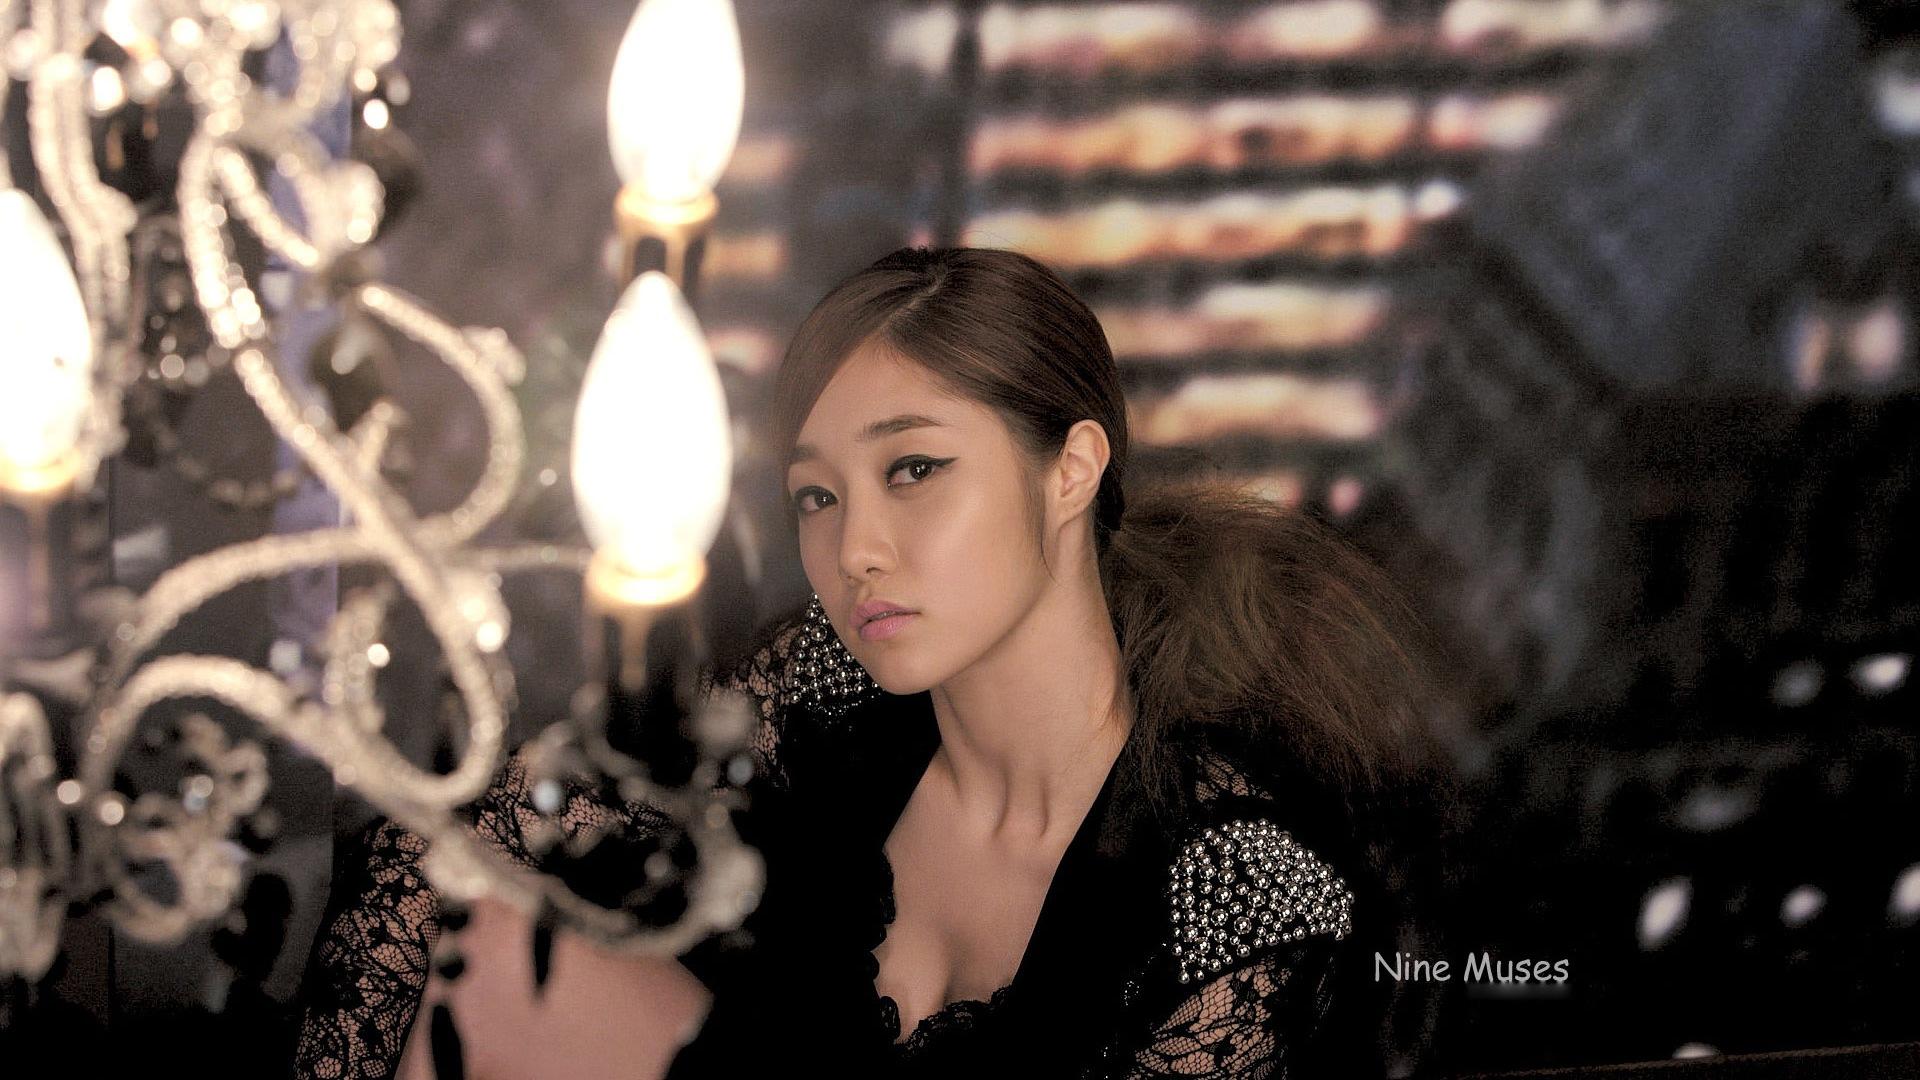 Korean Girl group Nine Muses HD Wallpapers #8 - 1920x1080